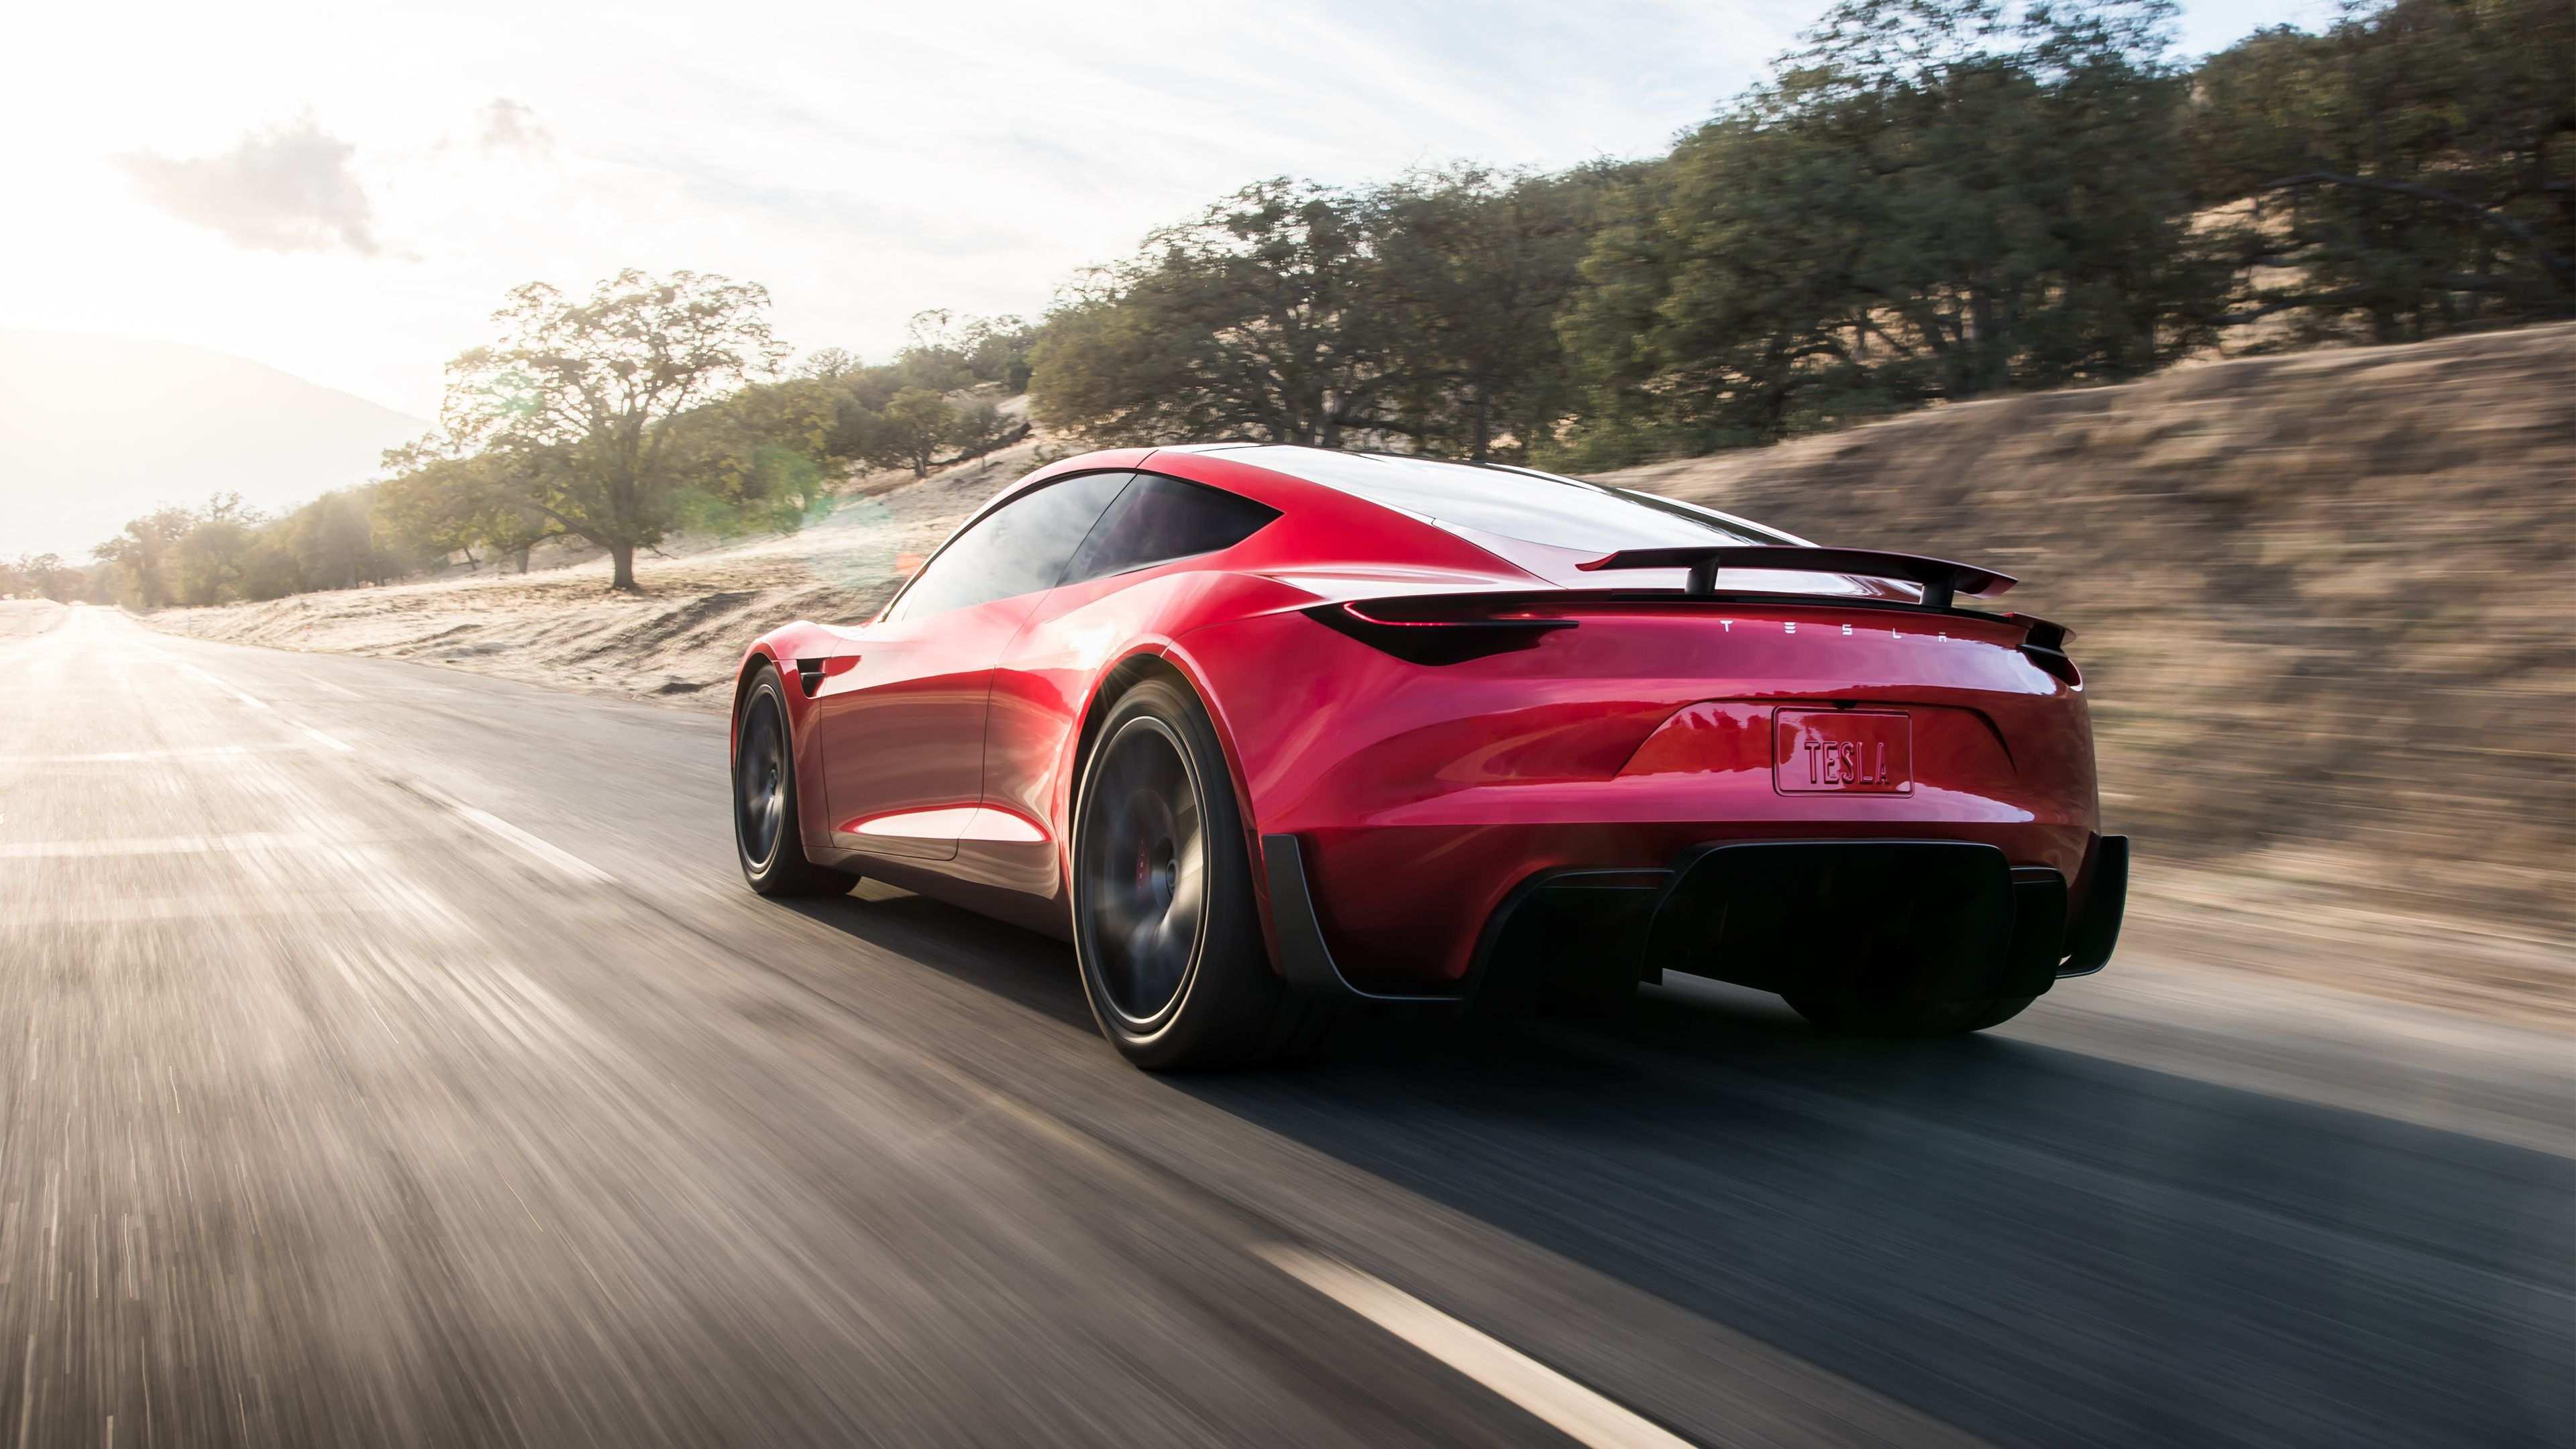 19 All New 2020 Tesla Roadster Torque Images by 2020 Tesla Roadster Torque